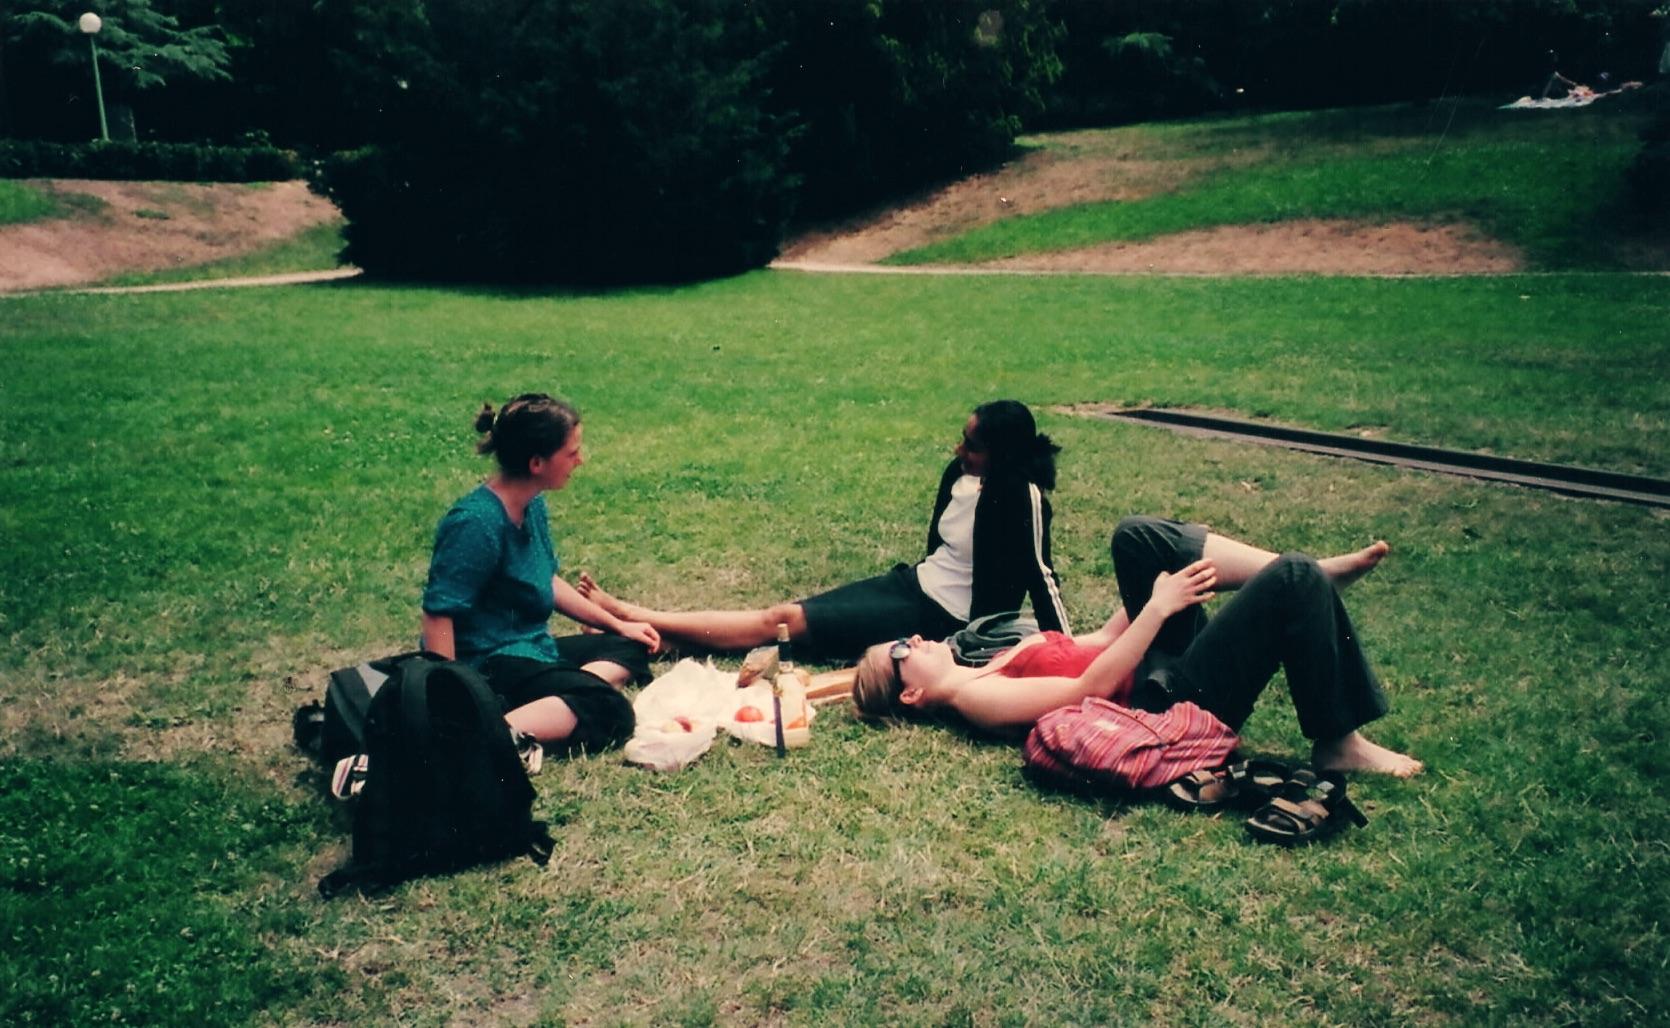 A wonderful lazy day with friends in the  Parc de la Tête d'Or  in Lyon.